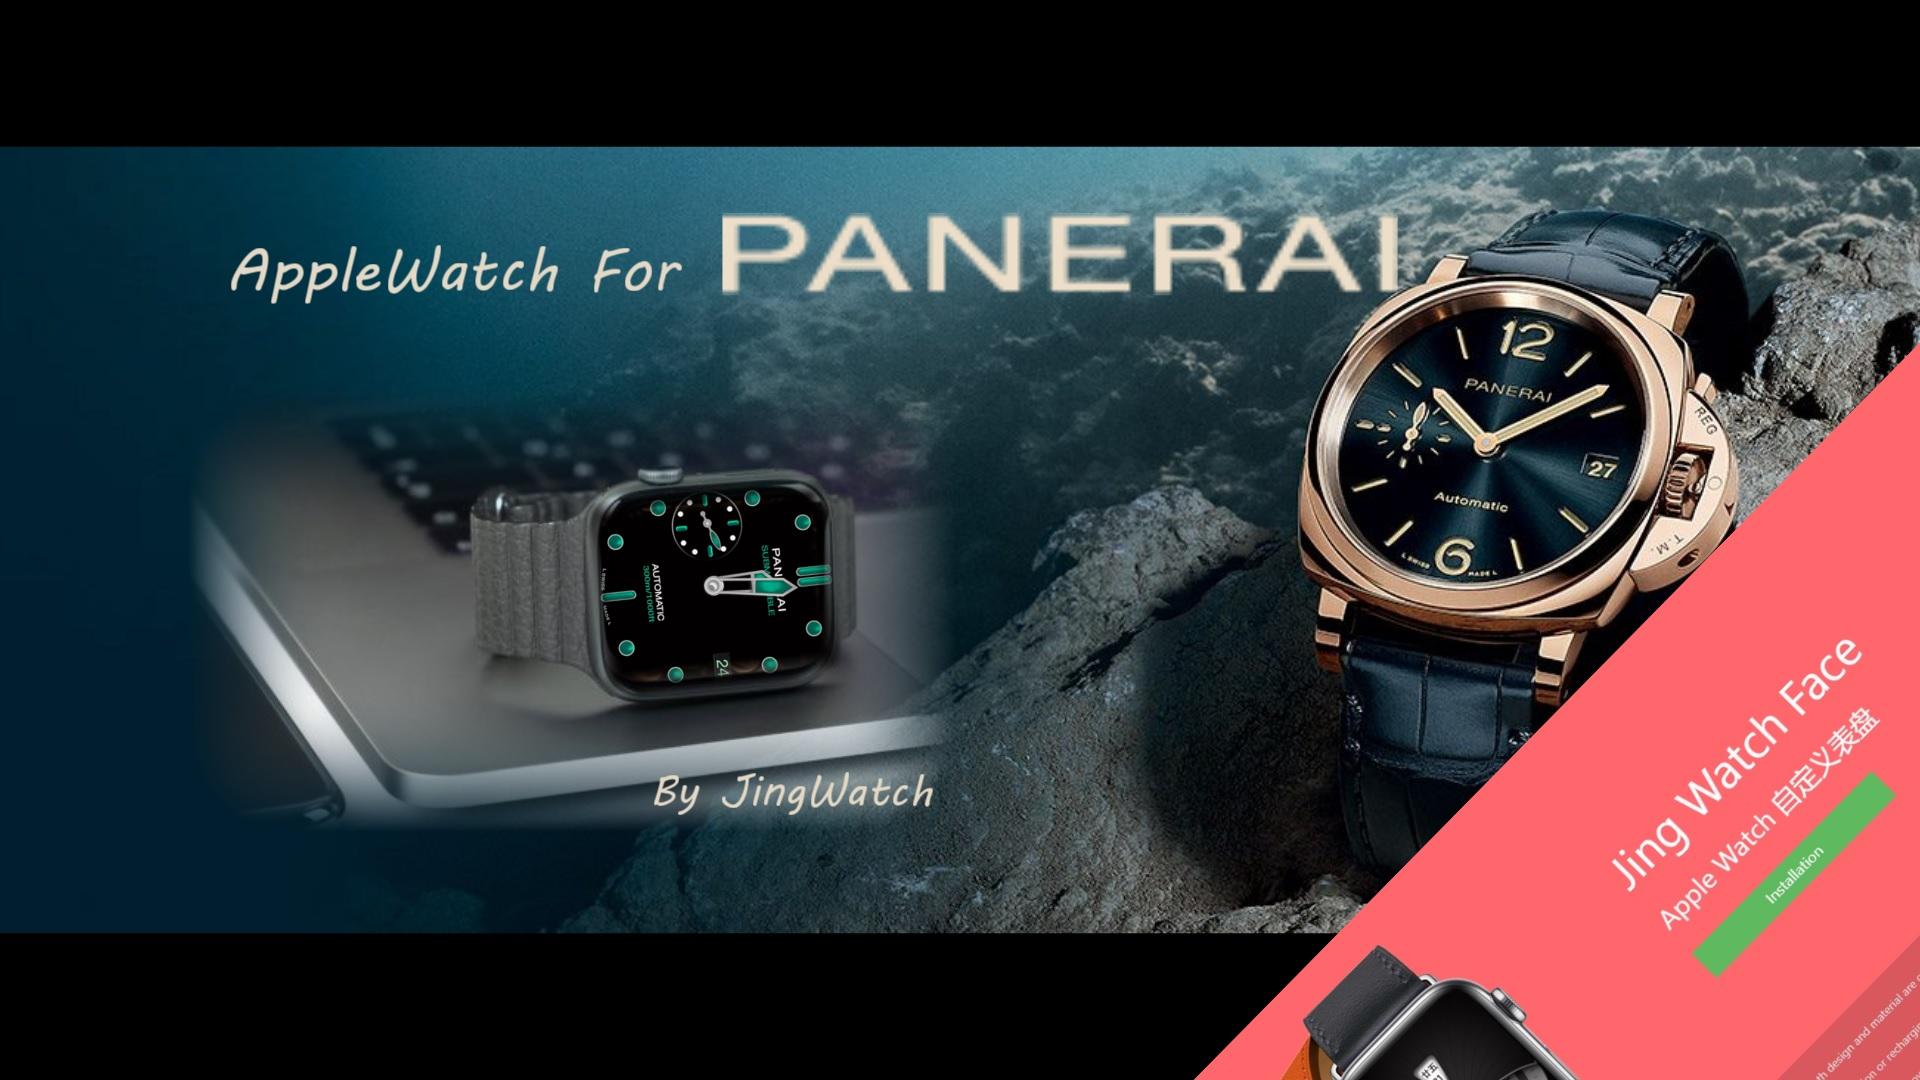 AppleWatch for Panerai